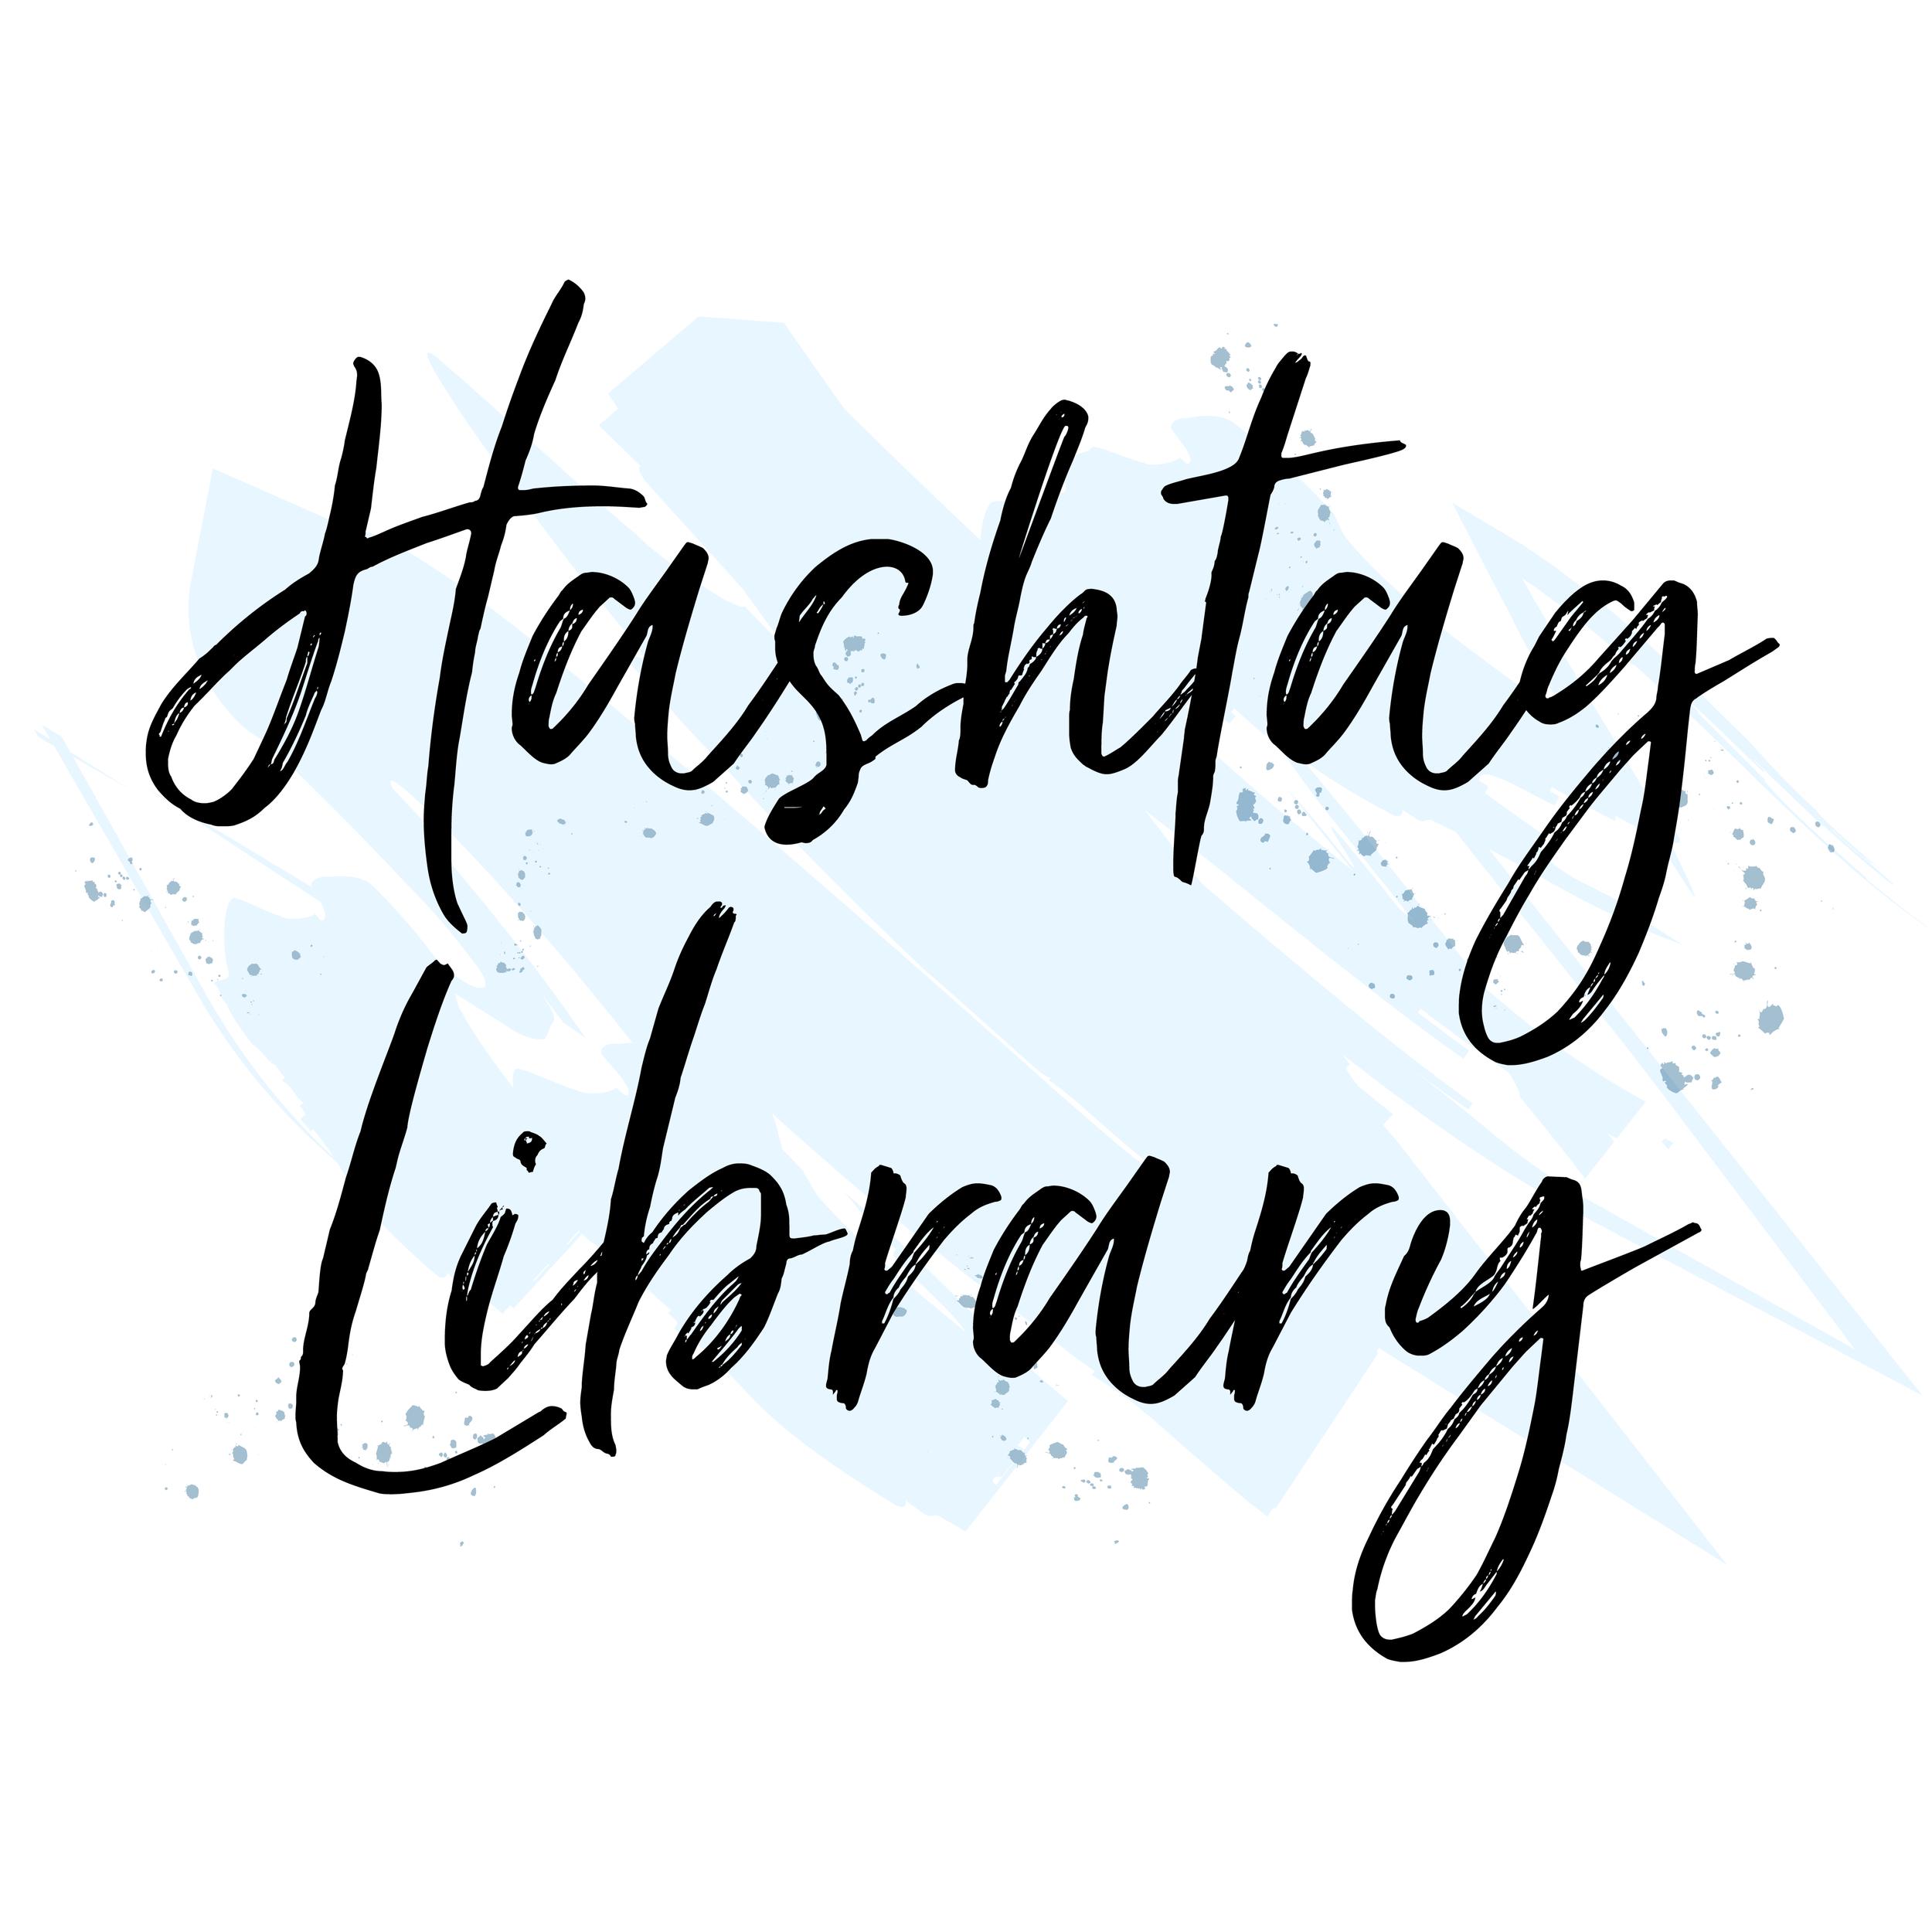 instacrush hashtag library